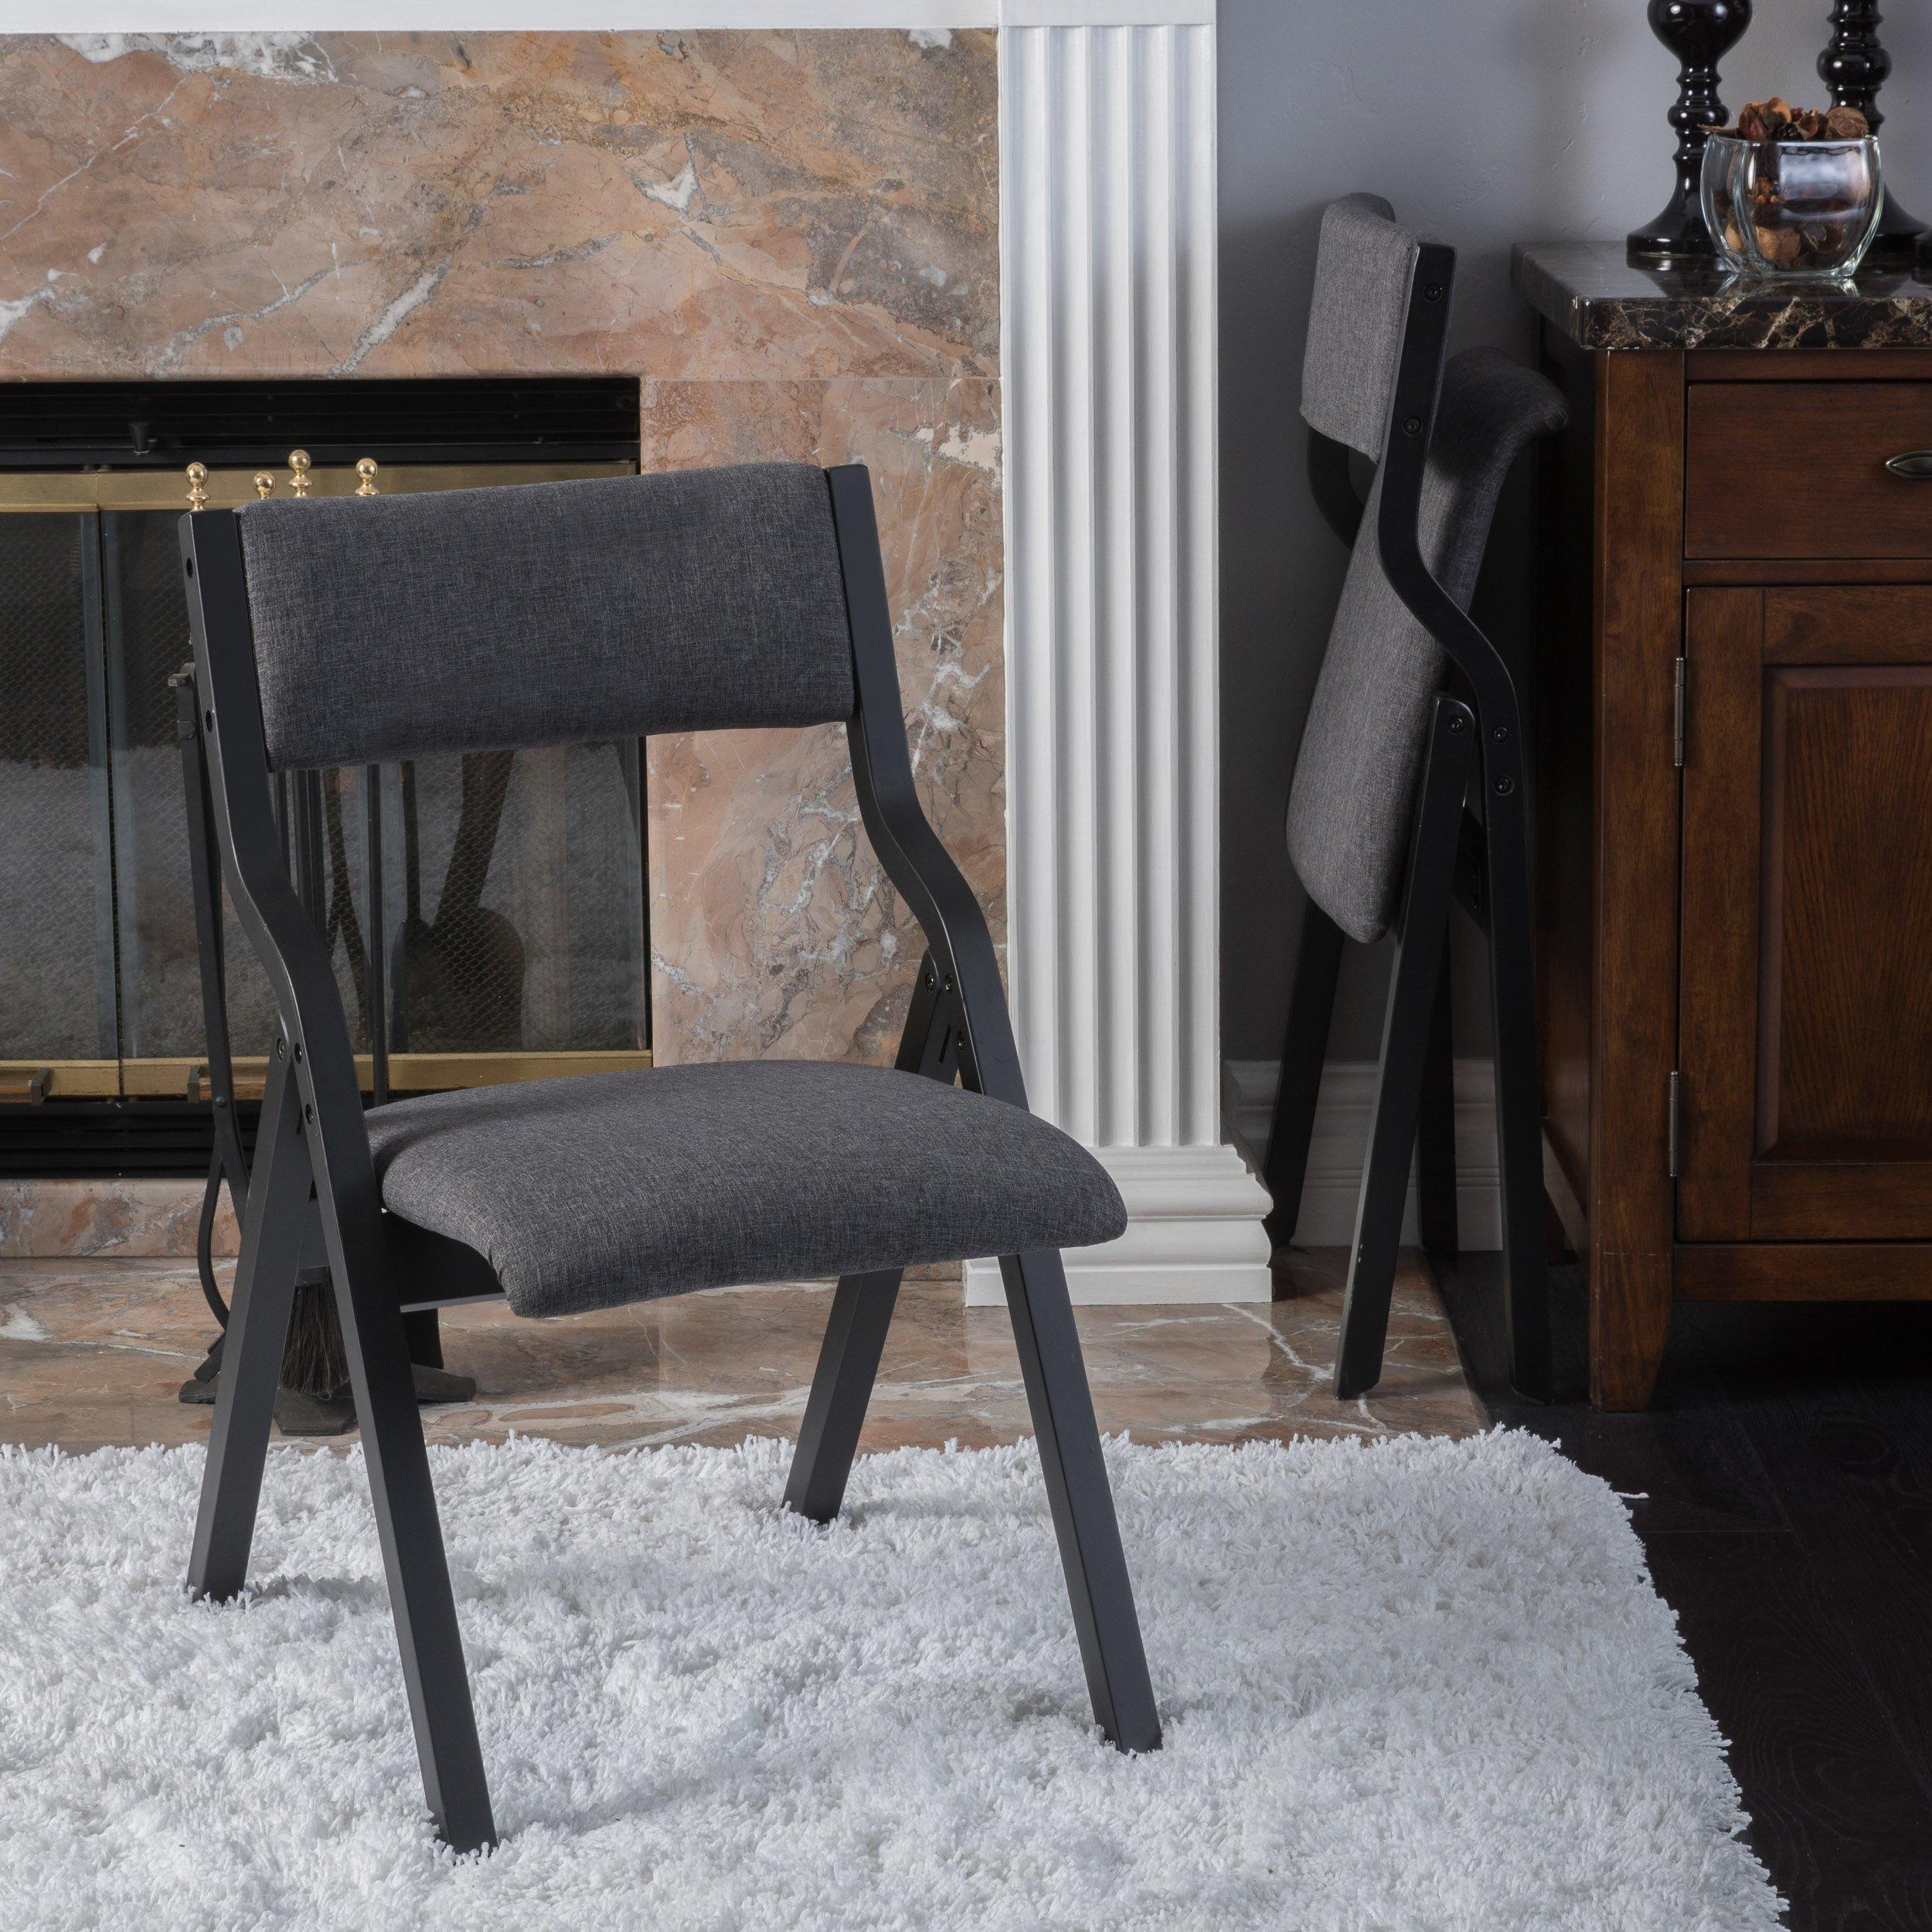 Christopher Knight Home 296212 Aneka Chair, Smoky